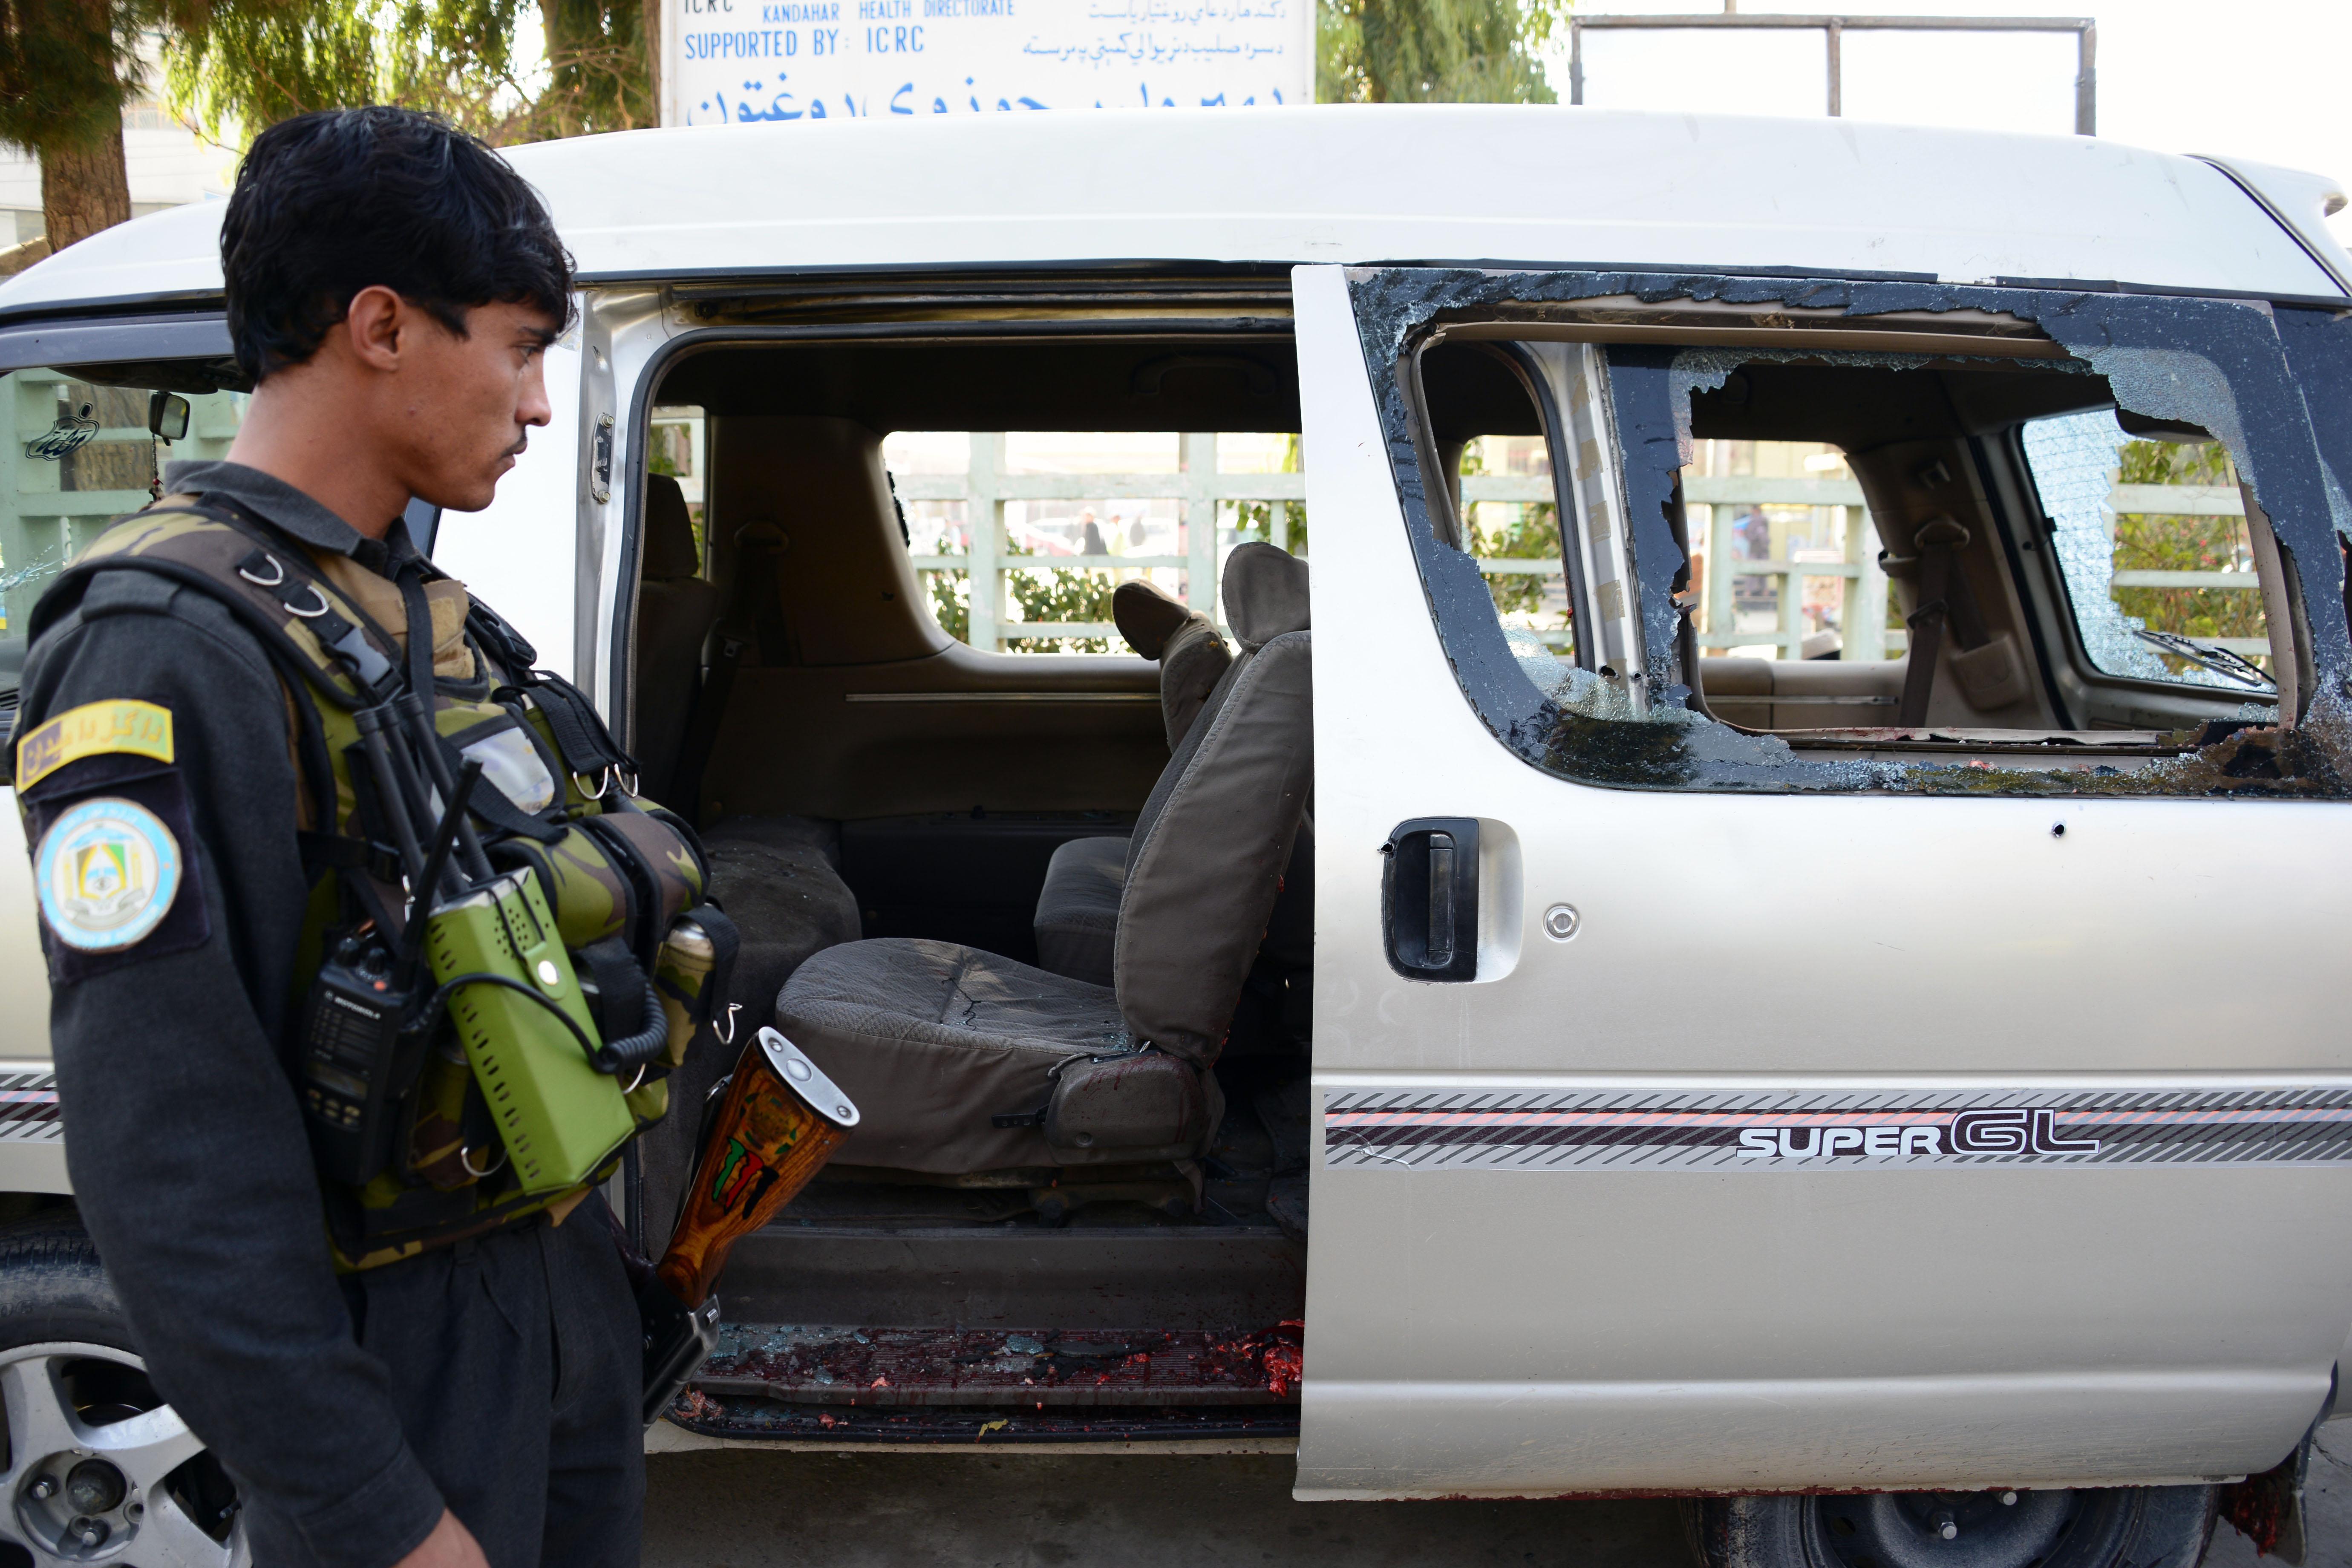 Afghans condemn fatal shooting of women in Kandahar